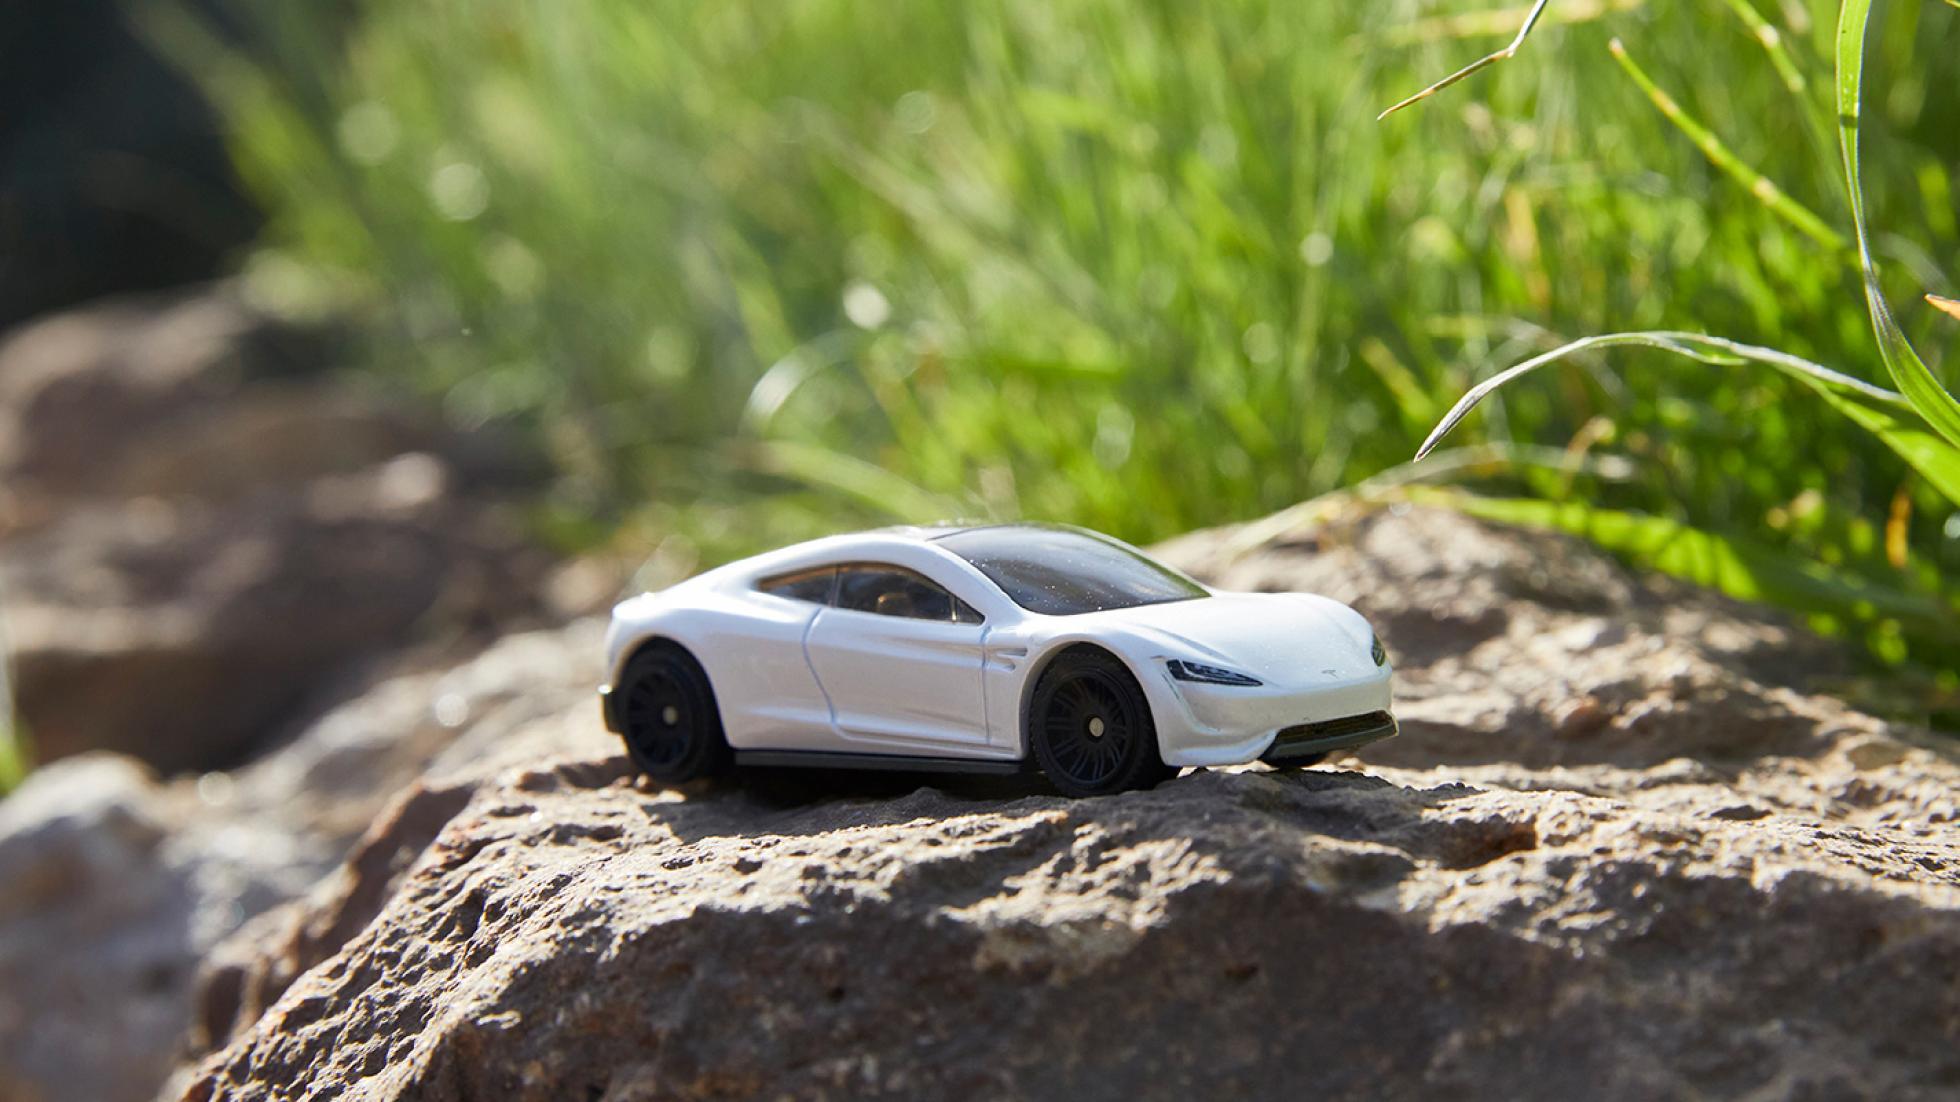 White Tesla matchbox toy car